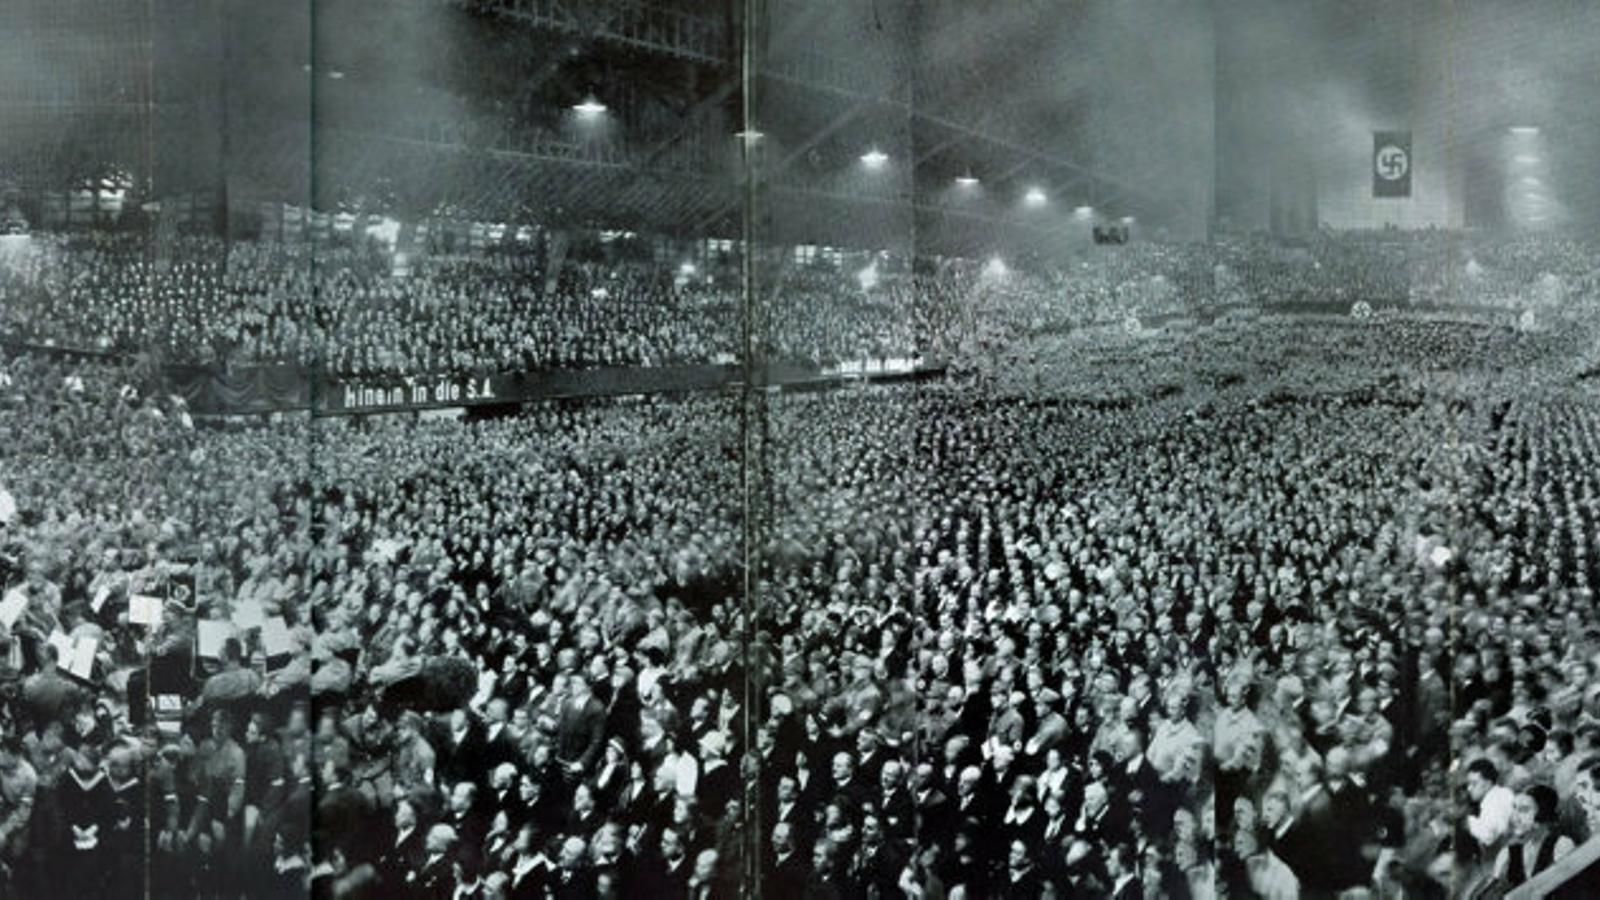 Qui es va resistir a Hitler i Mussolini?